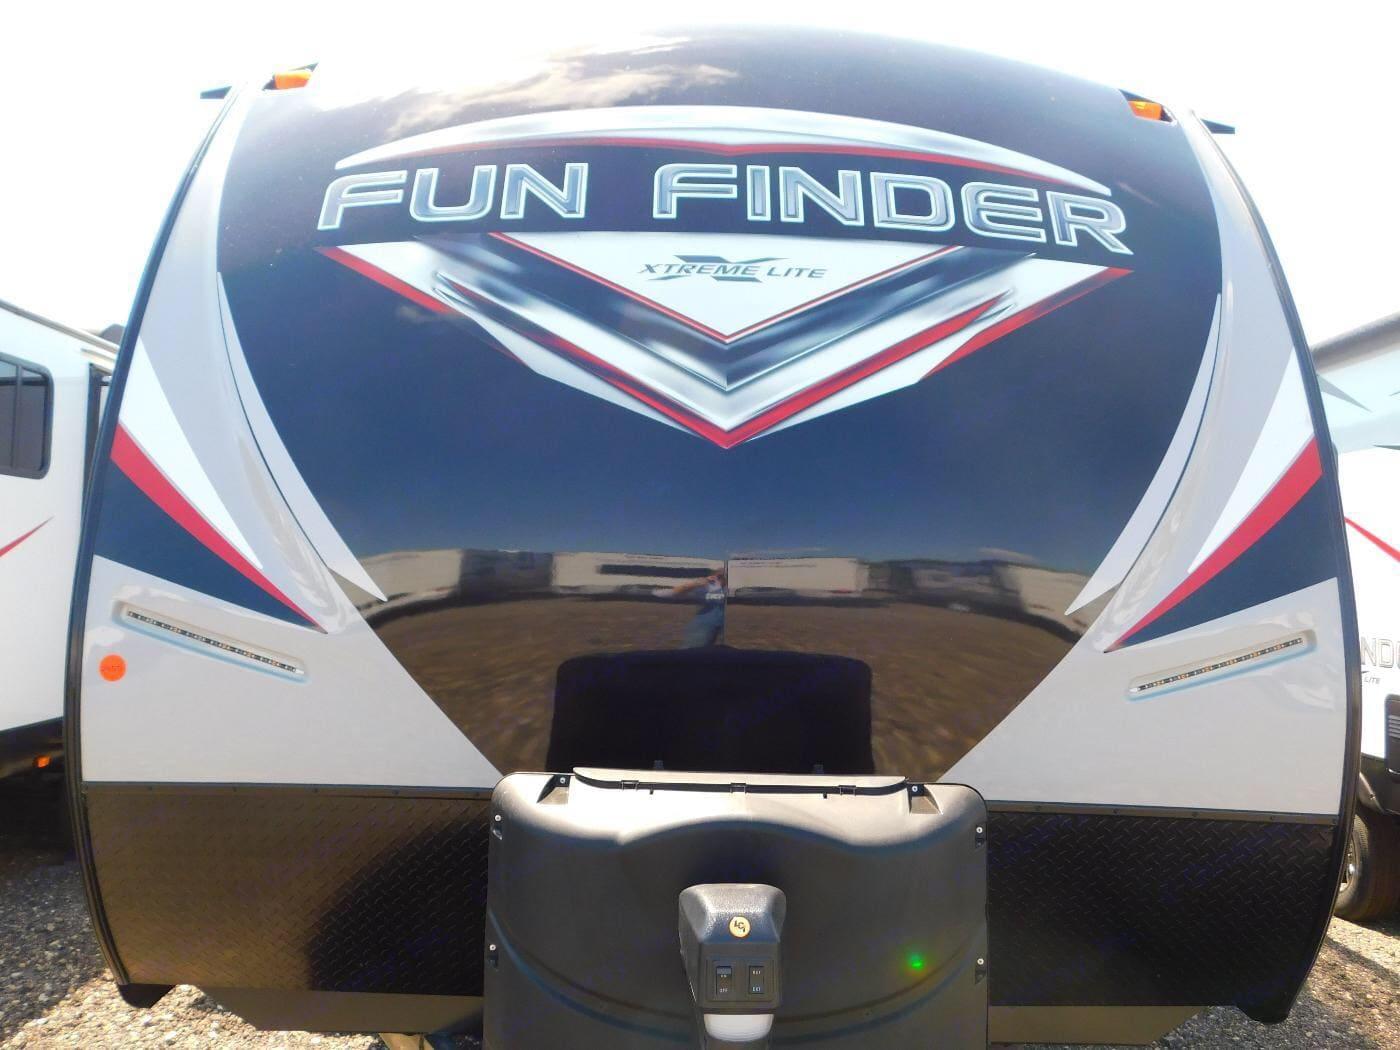 Cruiser Rv Corp Fun Finder Xtra 2018